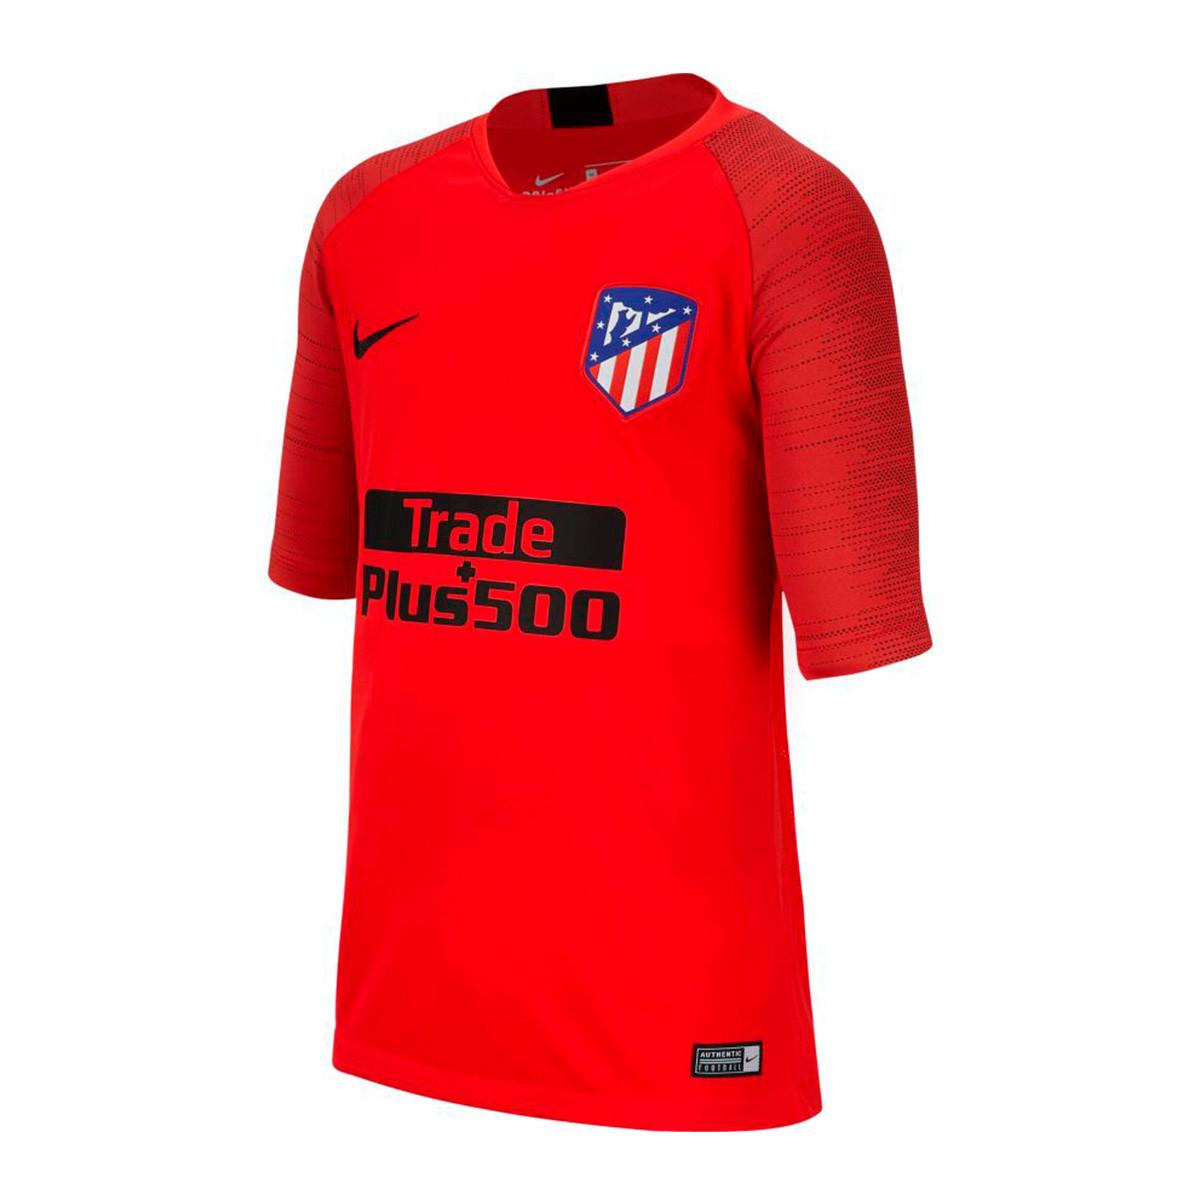 066e0b8b36a00 Jersey Nike Kids Atletico Madrid Breathe Strike Top SS 2019-2020 Challenge  red-Black - Nike Mercurial Superfly | Shop Nike Soccer Cleats ypsoccer.com